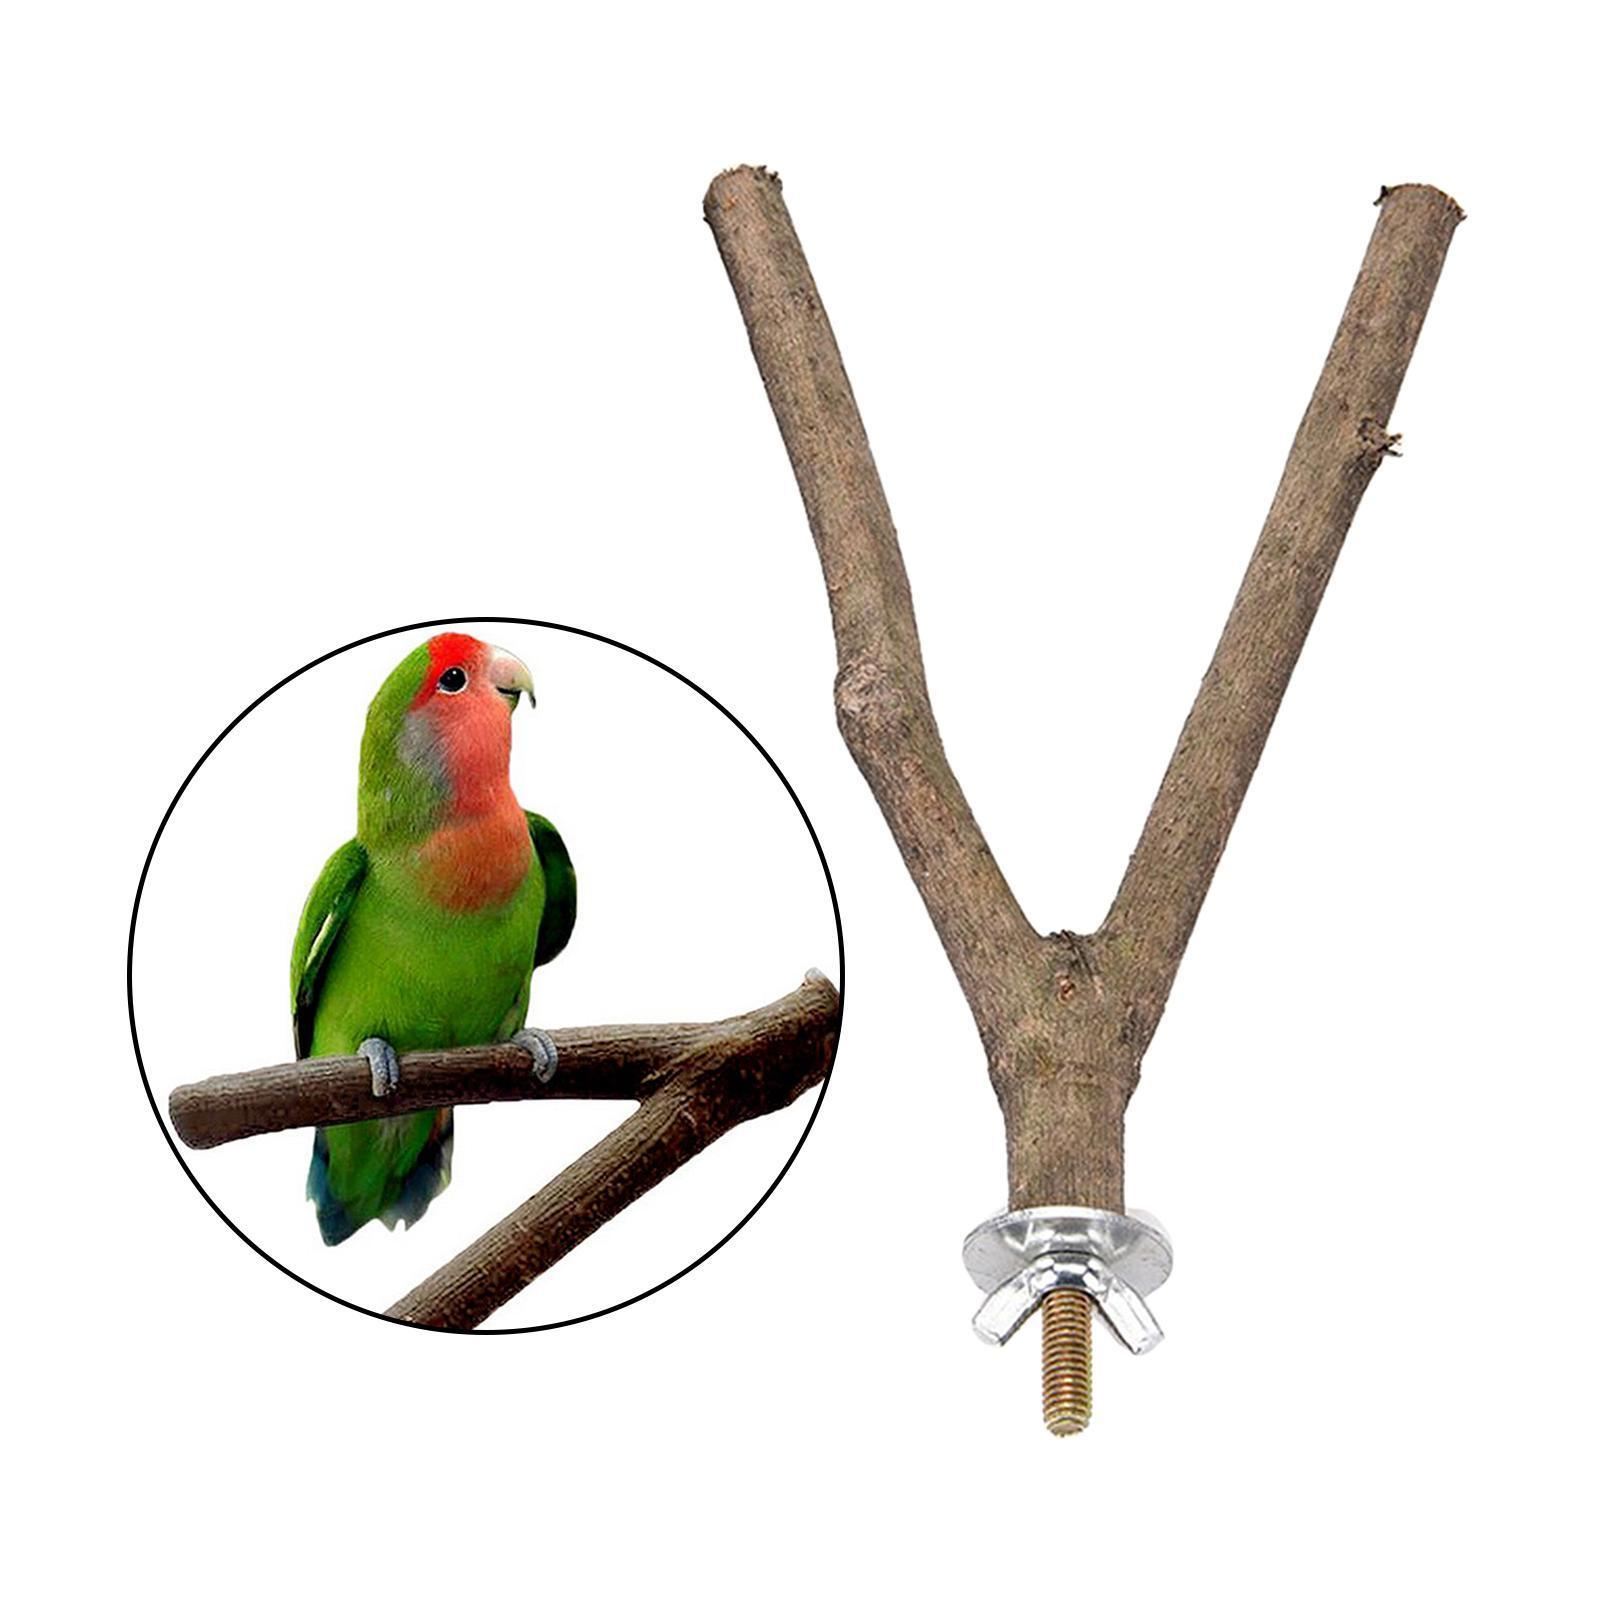 thumbnail 36 - Bird-Perch-Wood-Stand-Bird-Cage-Swing-Branch-for-Parrot-Parakeet-Cockatiel